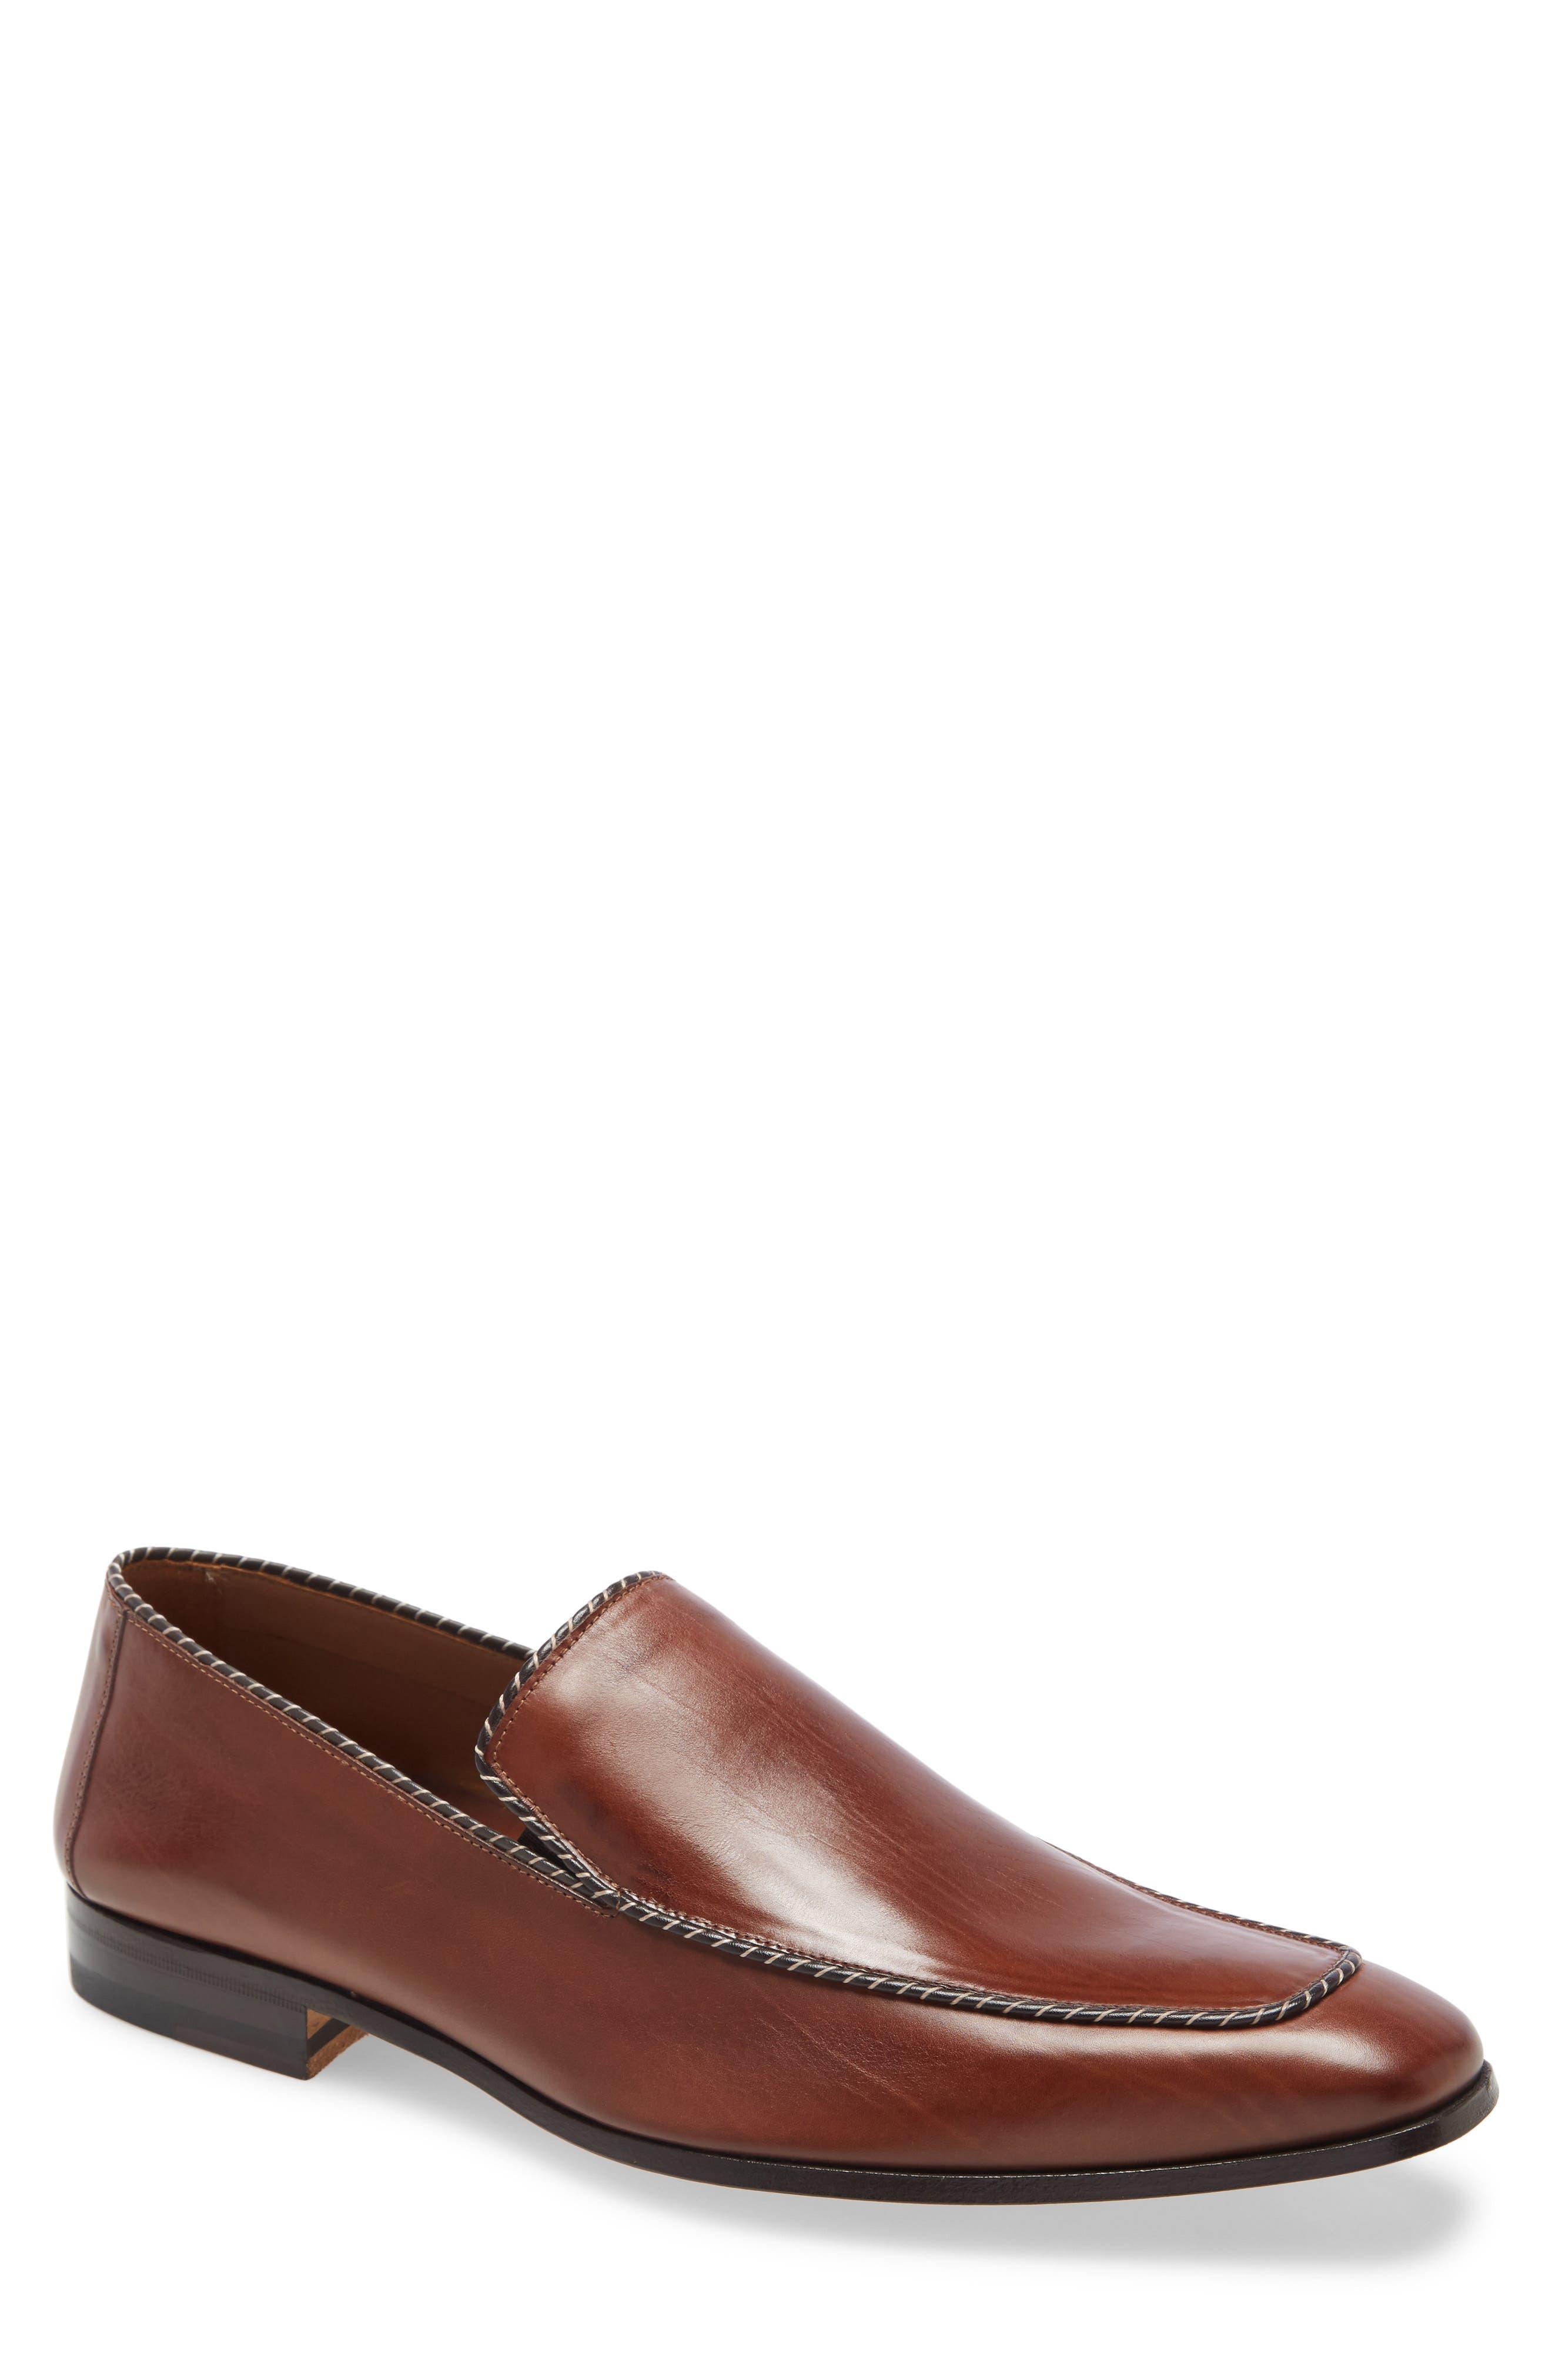 Men's Mezlan Loafers \u0026 Slip-Ons   Nordstrom